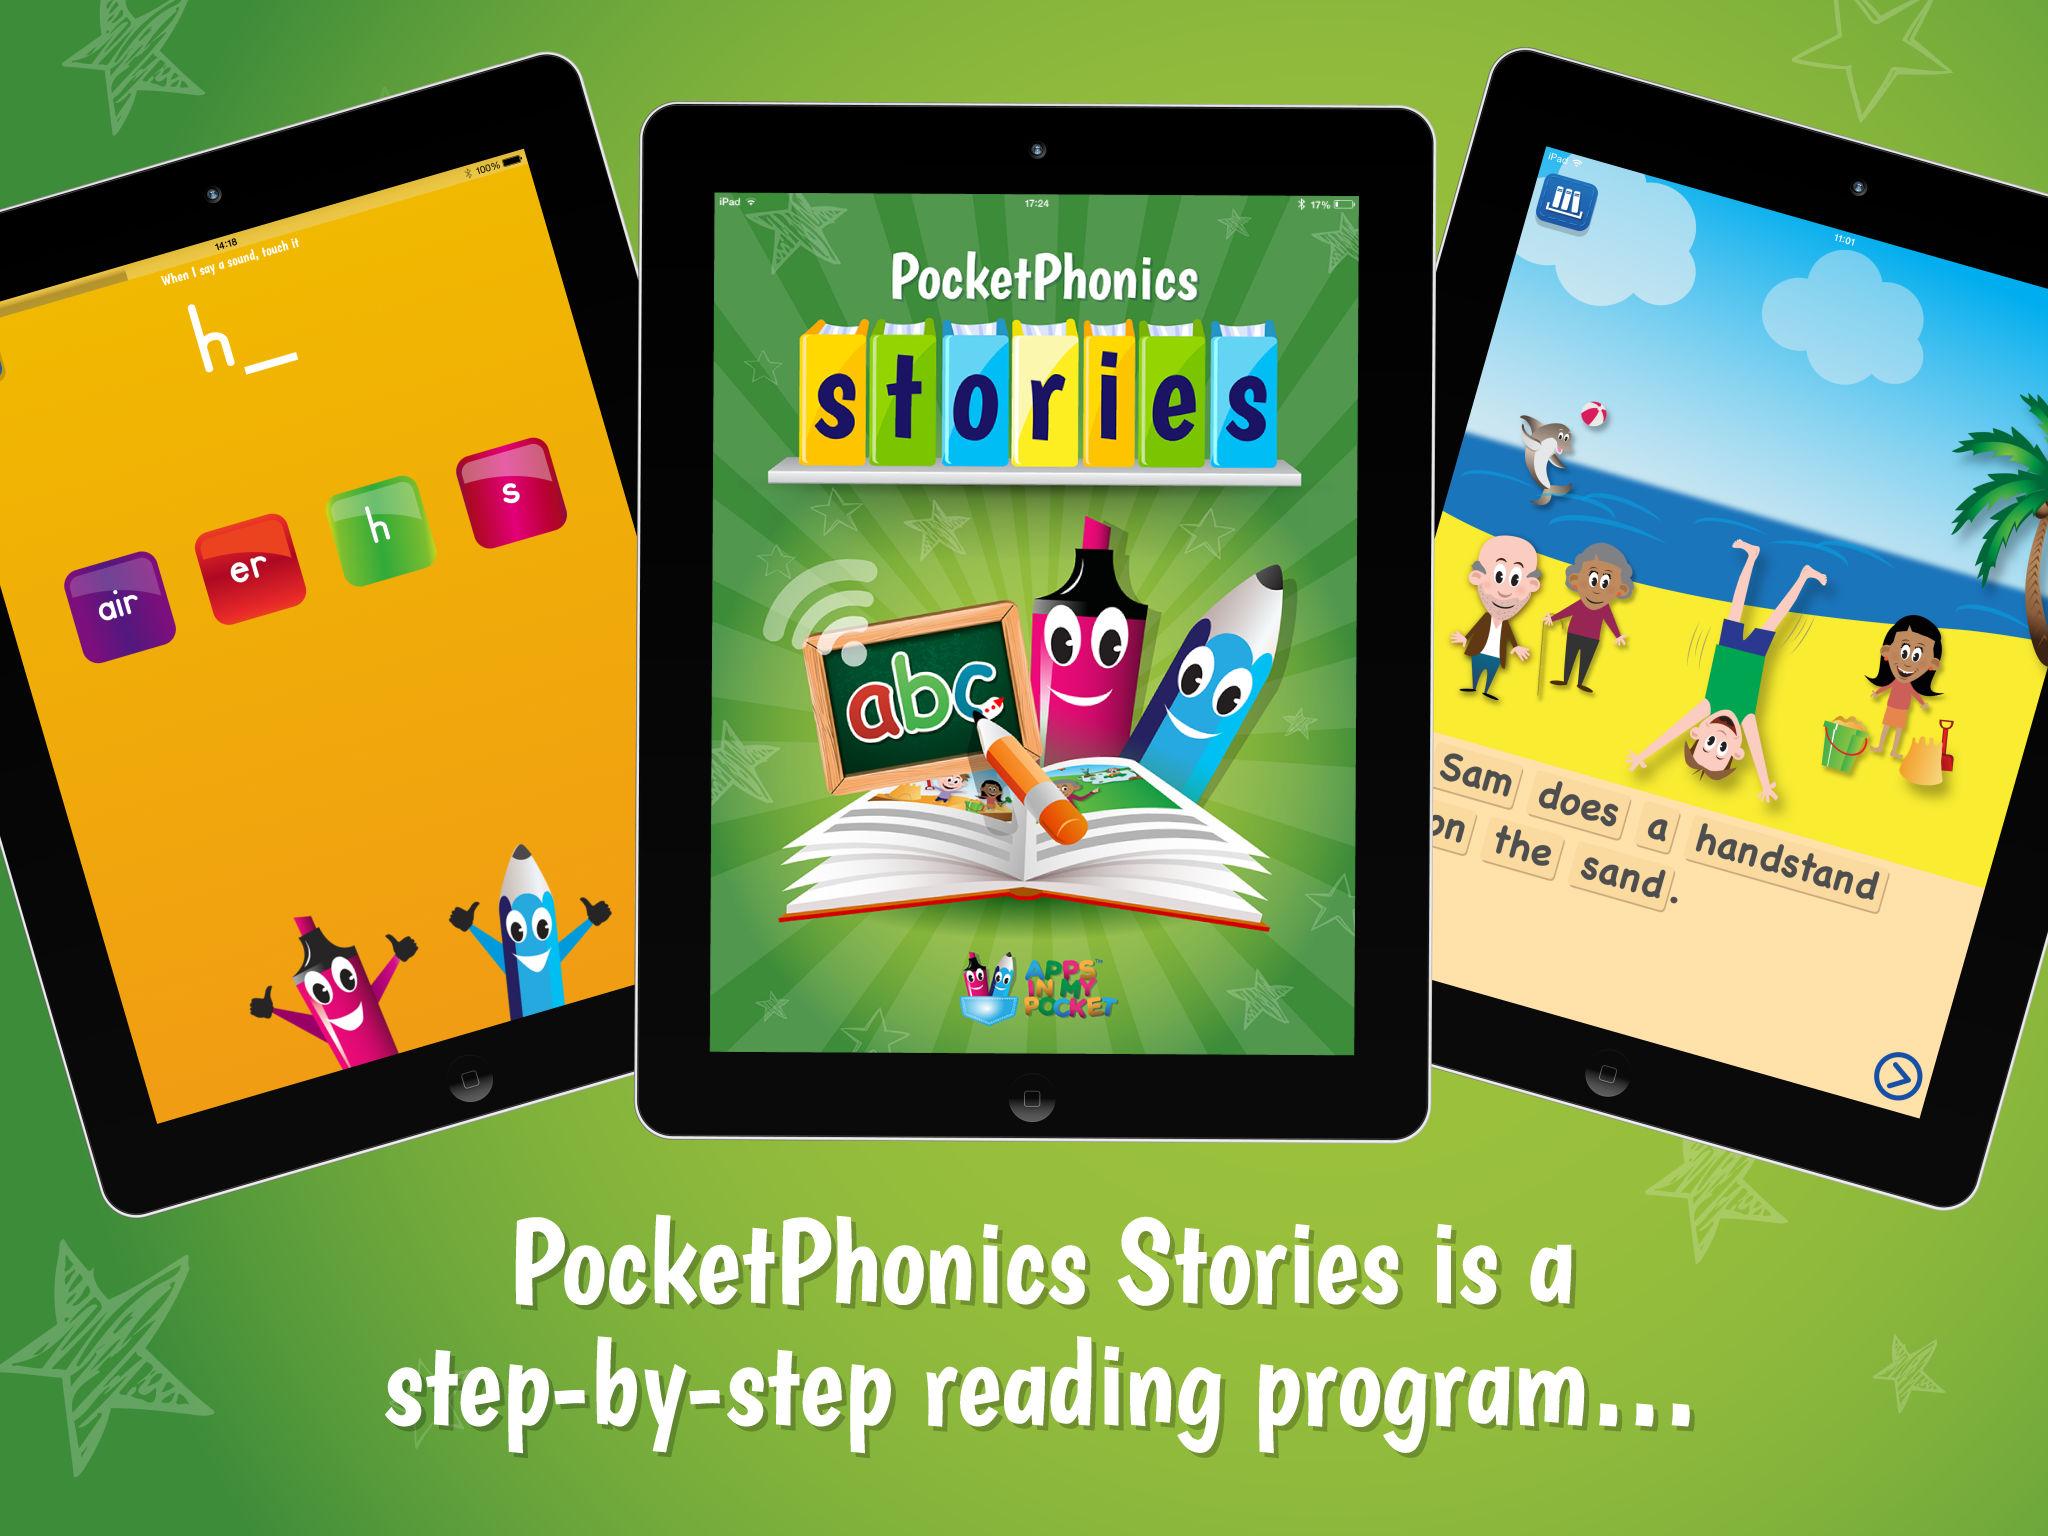 Pocket Phonics Stories